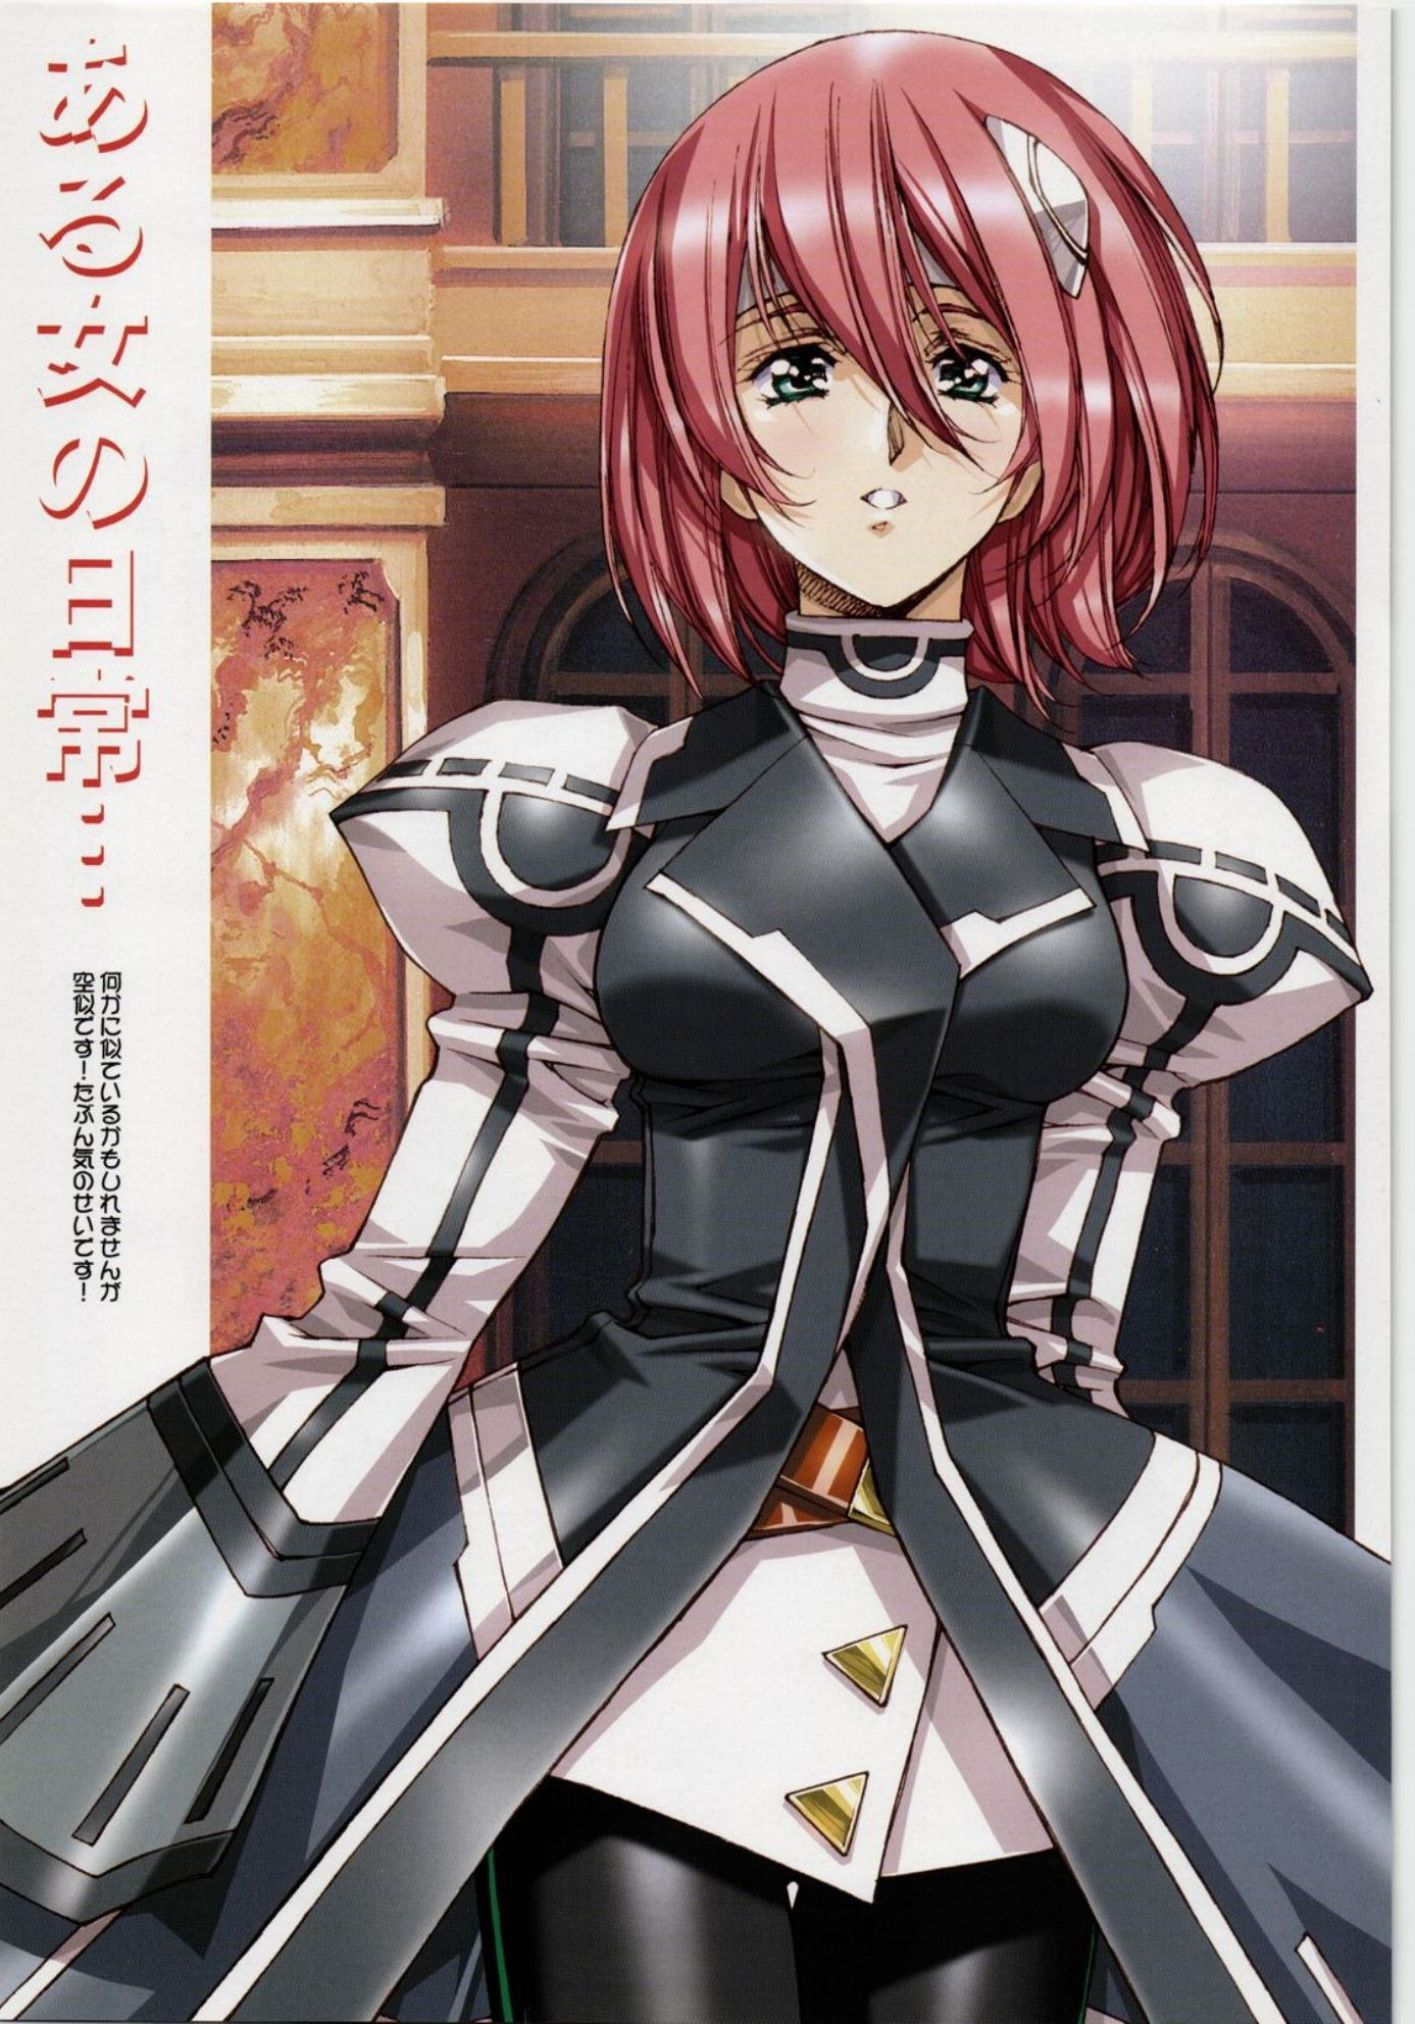 Urushihara Satoshi Image #119319 - Zerochan Anime Image Board